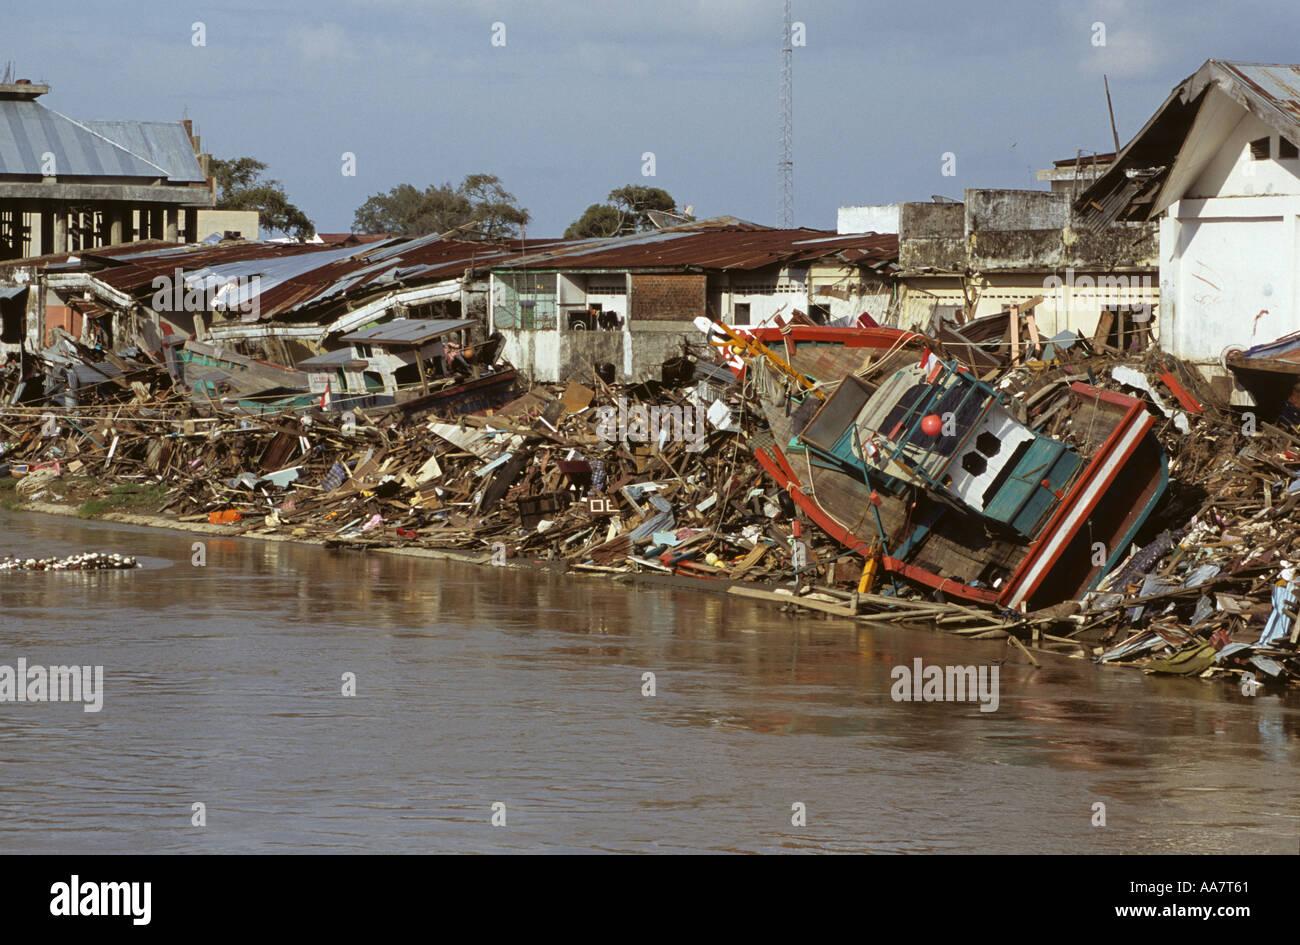 26th Dec 04 tsunami devastation Banda Aceh Stock Photo